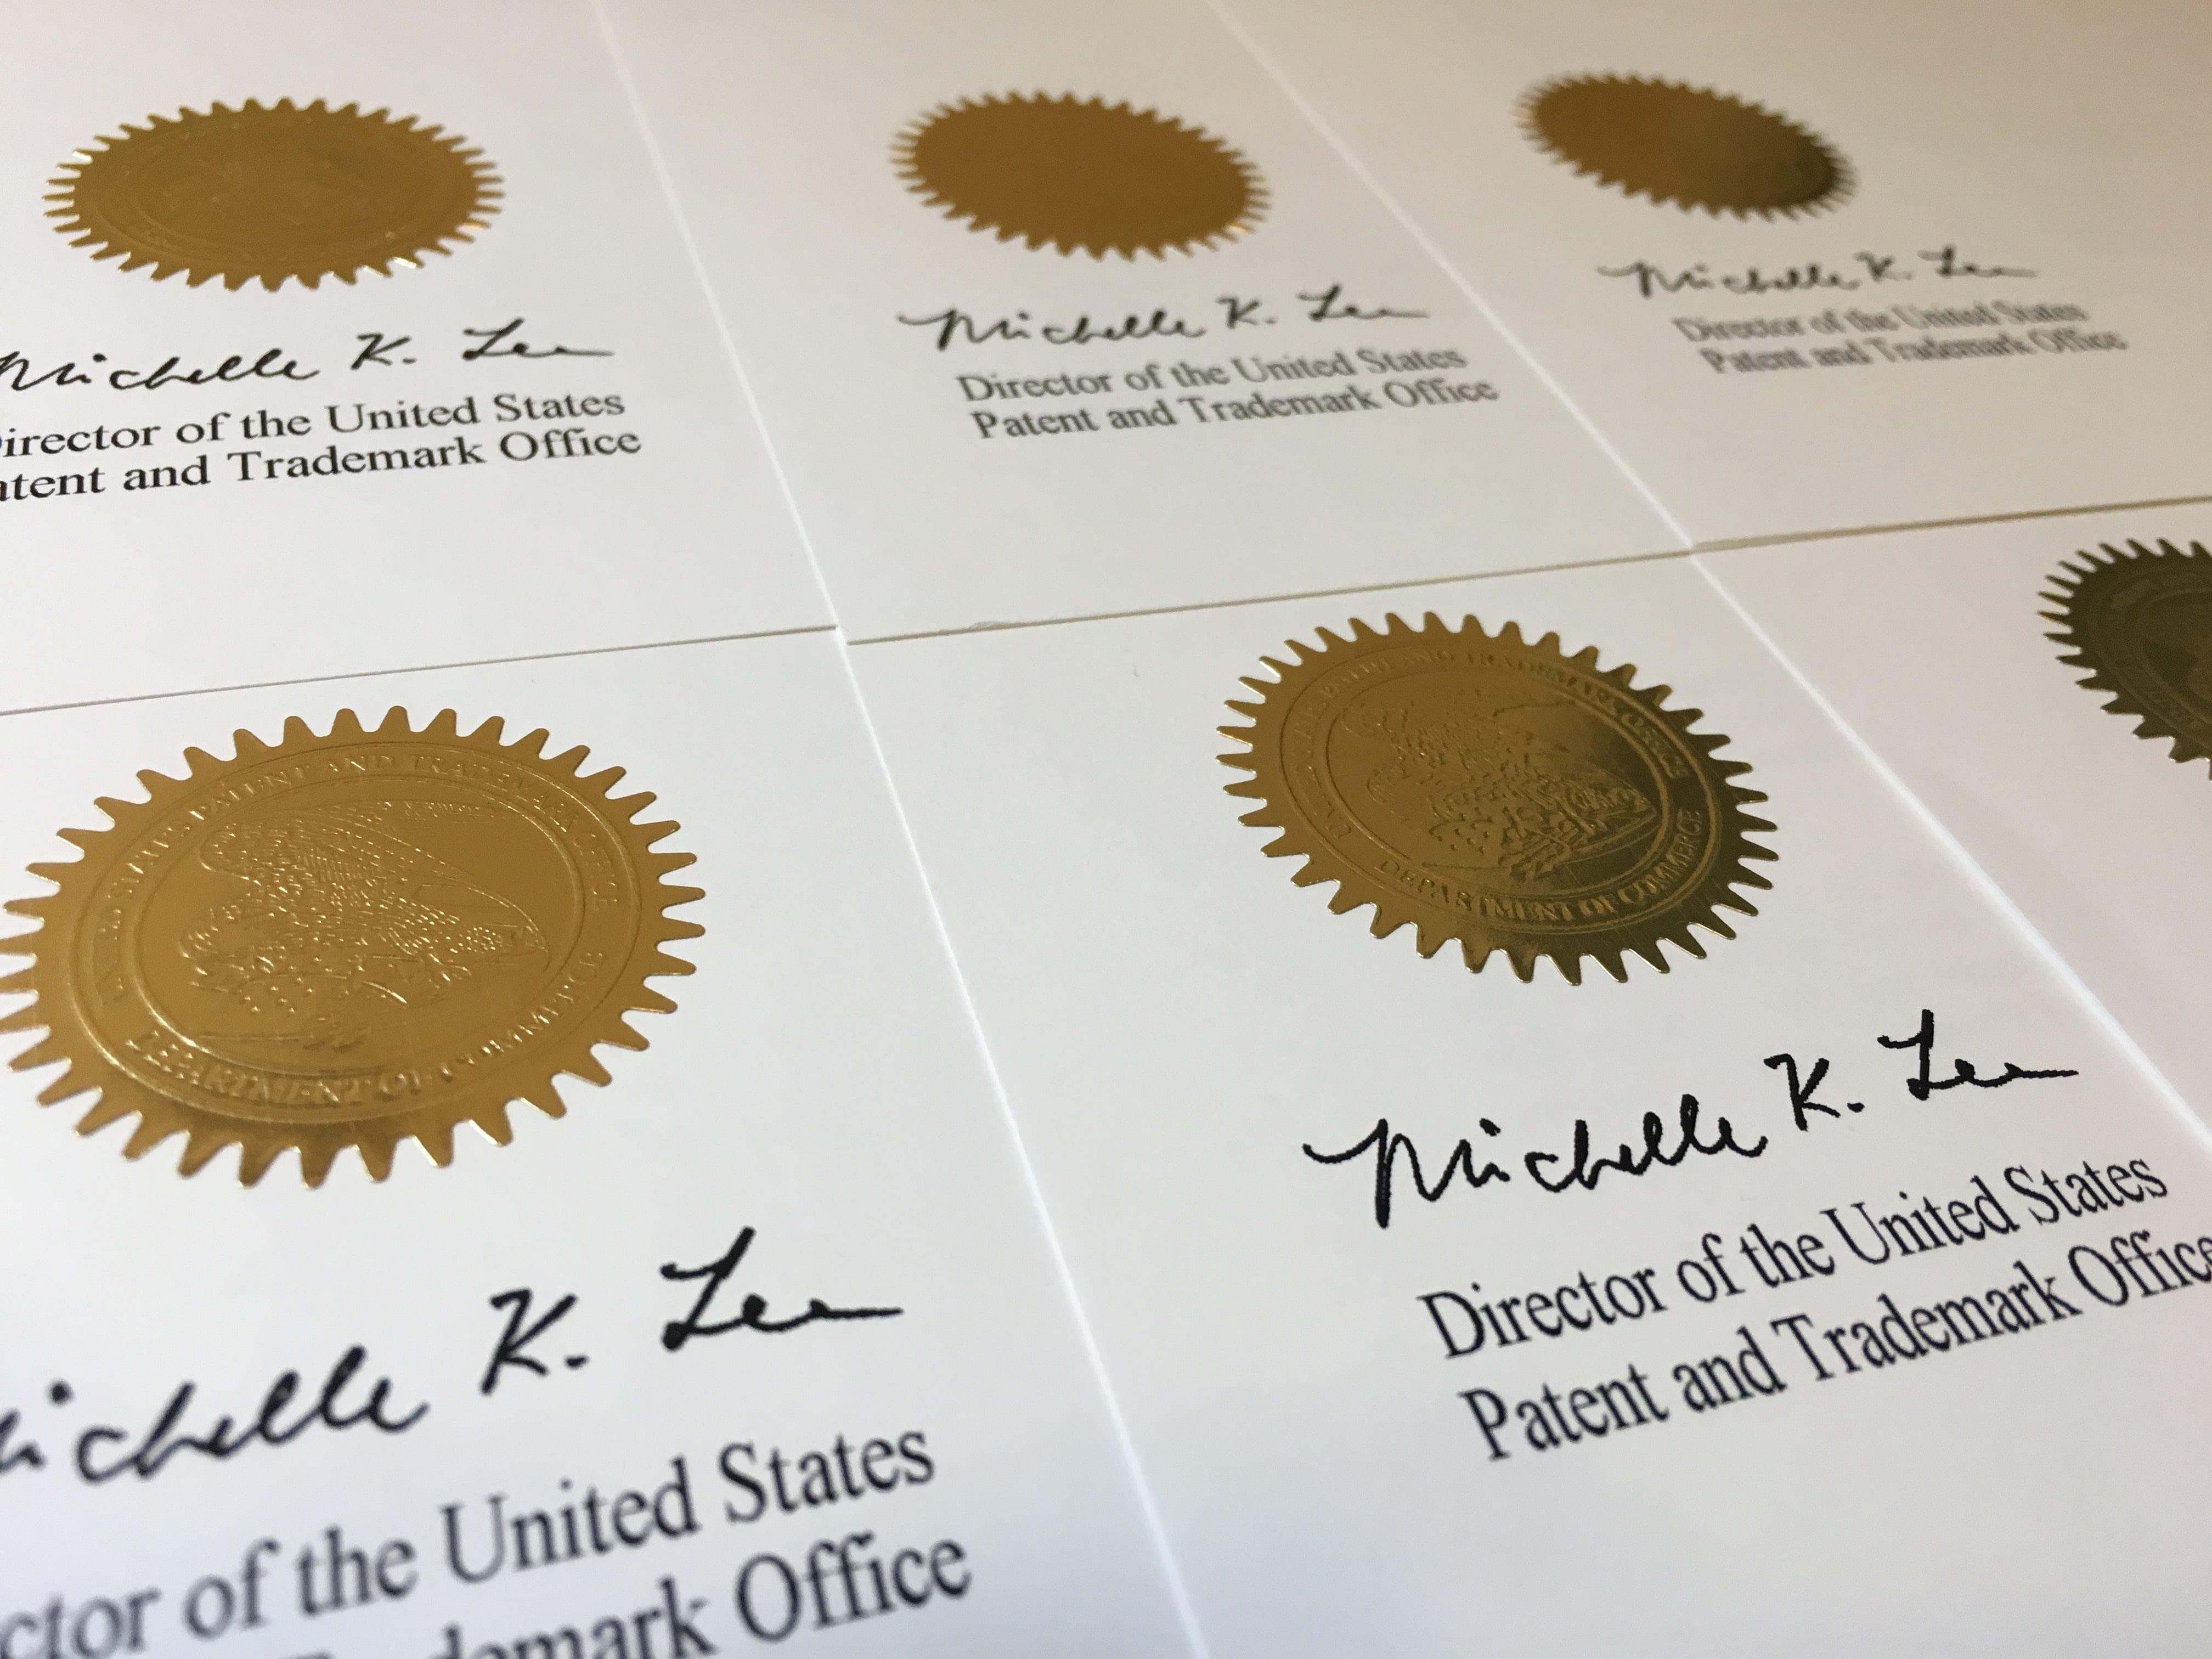 Samples of official registered trademark seals; image by MyBrandMark.com, via Pixels.com.